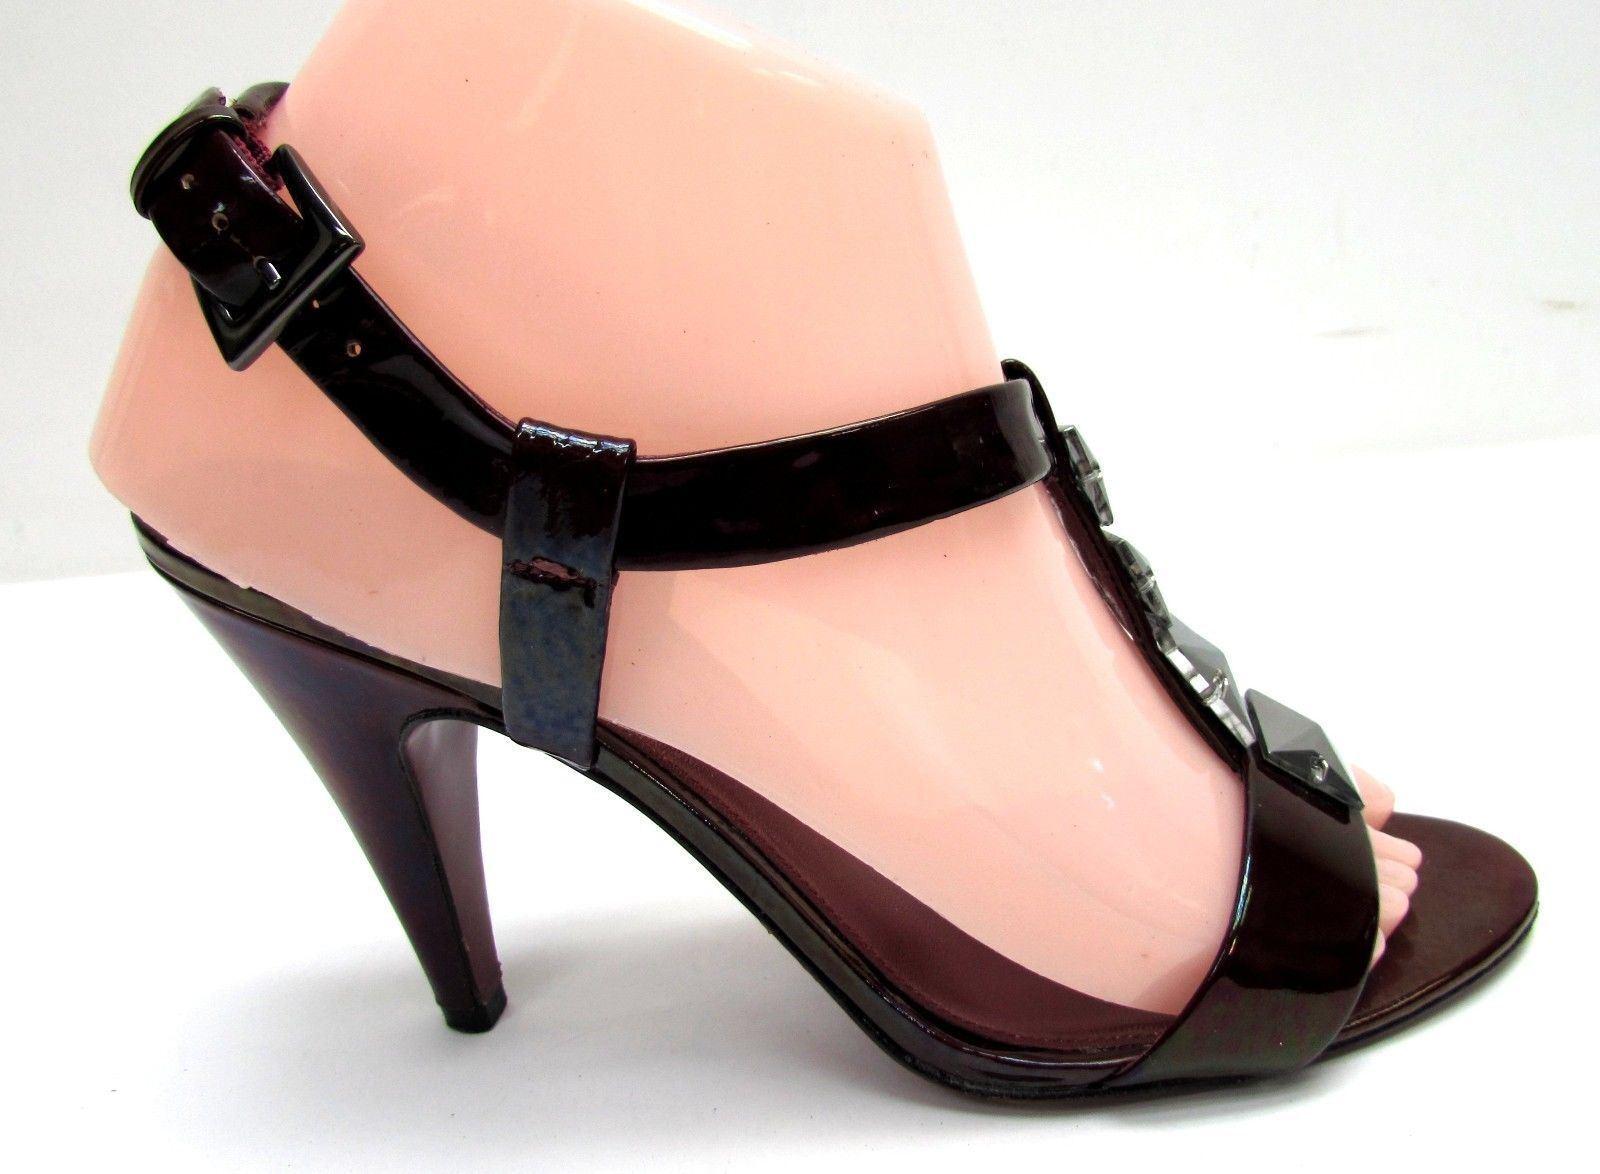 Via Spiga women's size 7 sandals M leather high heel sandals 7 shoes burgundy f9970a